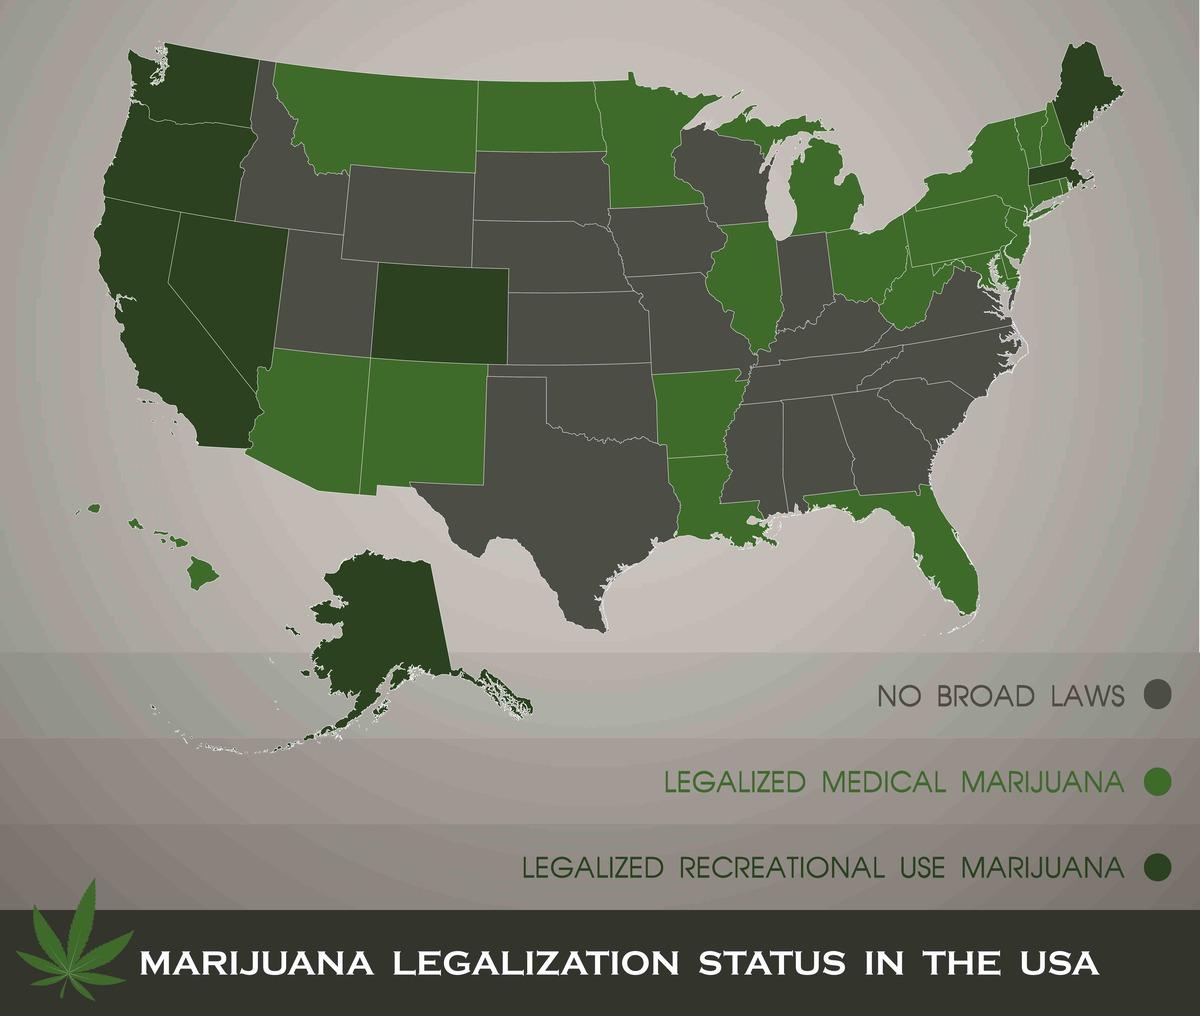 Marijuana legalization status map in the USA